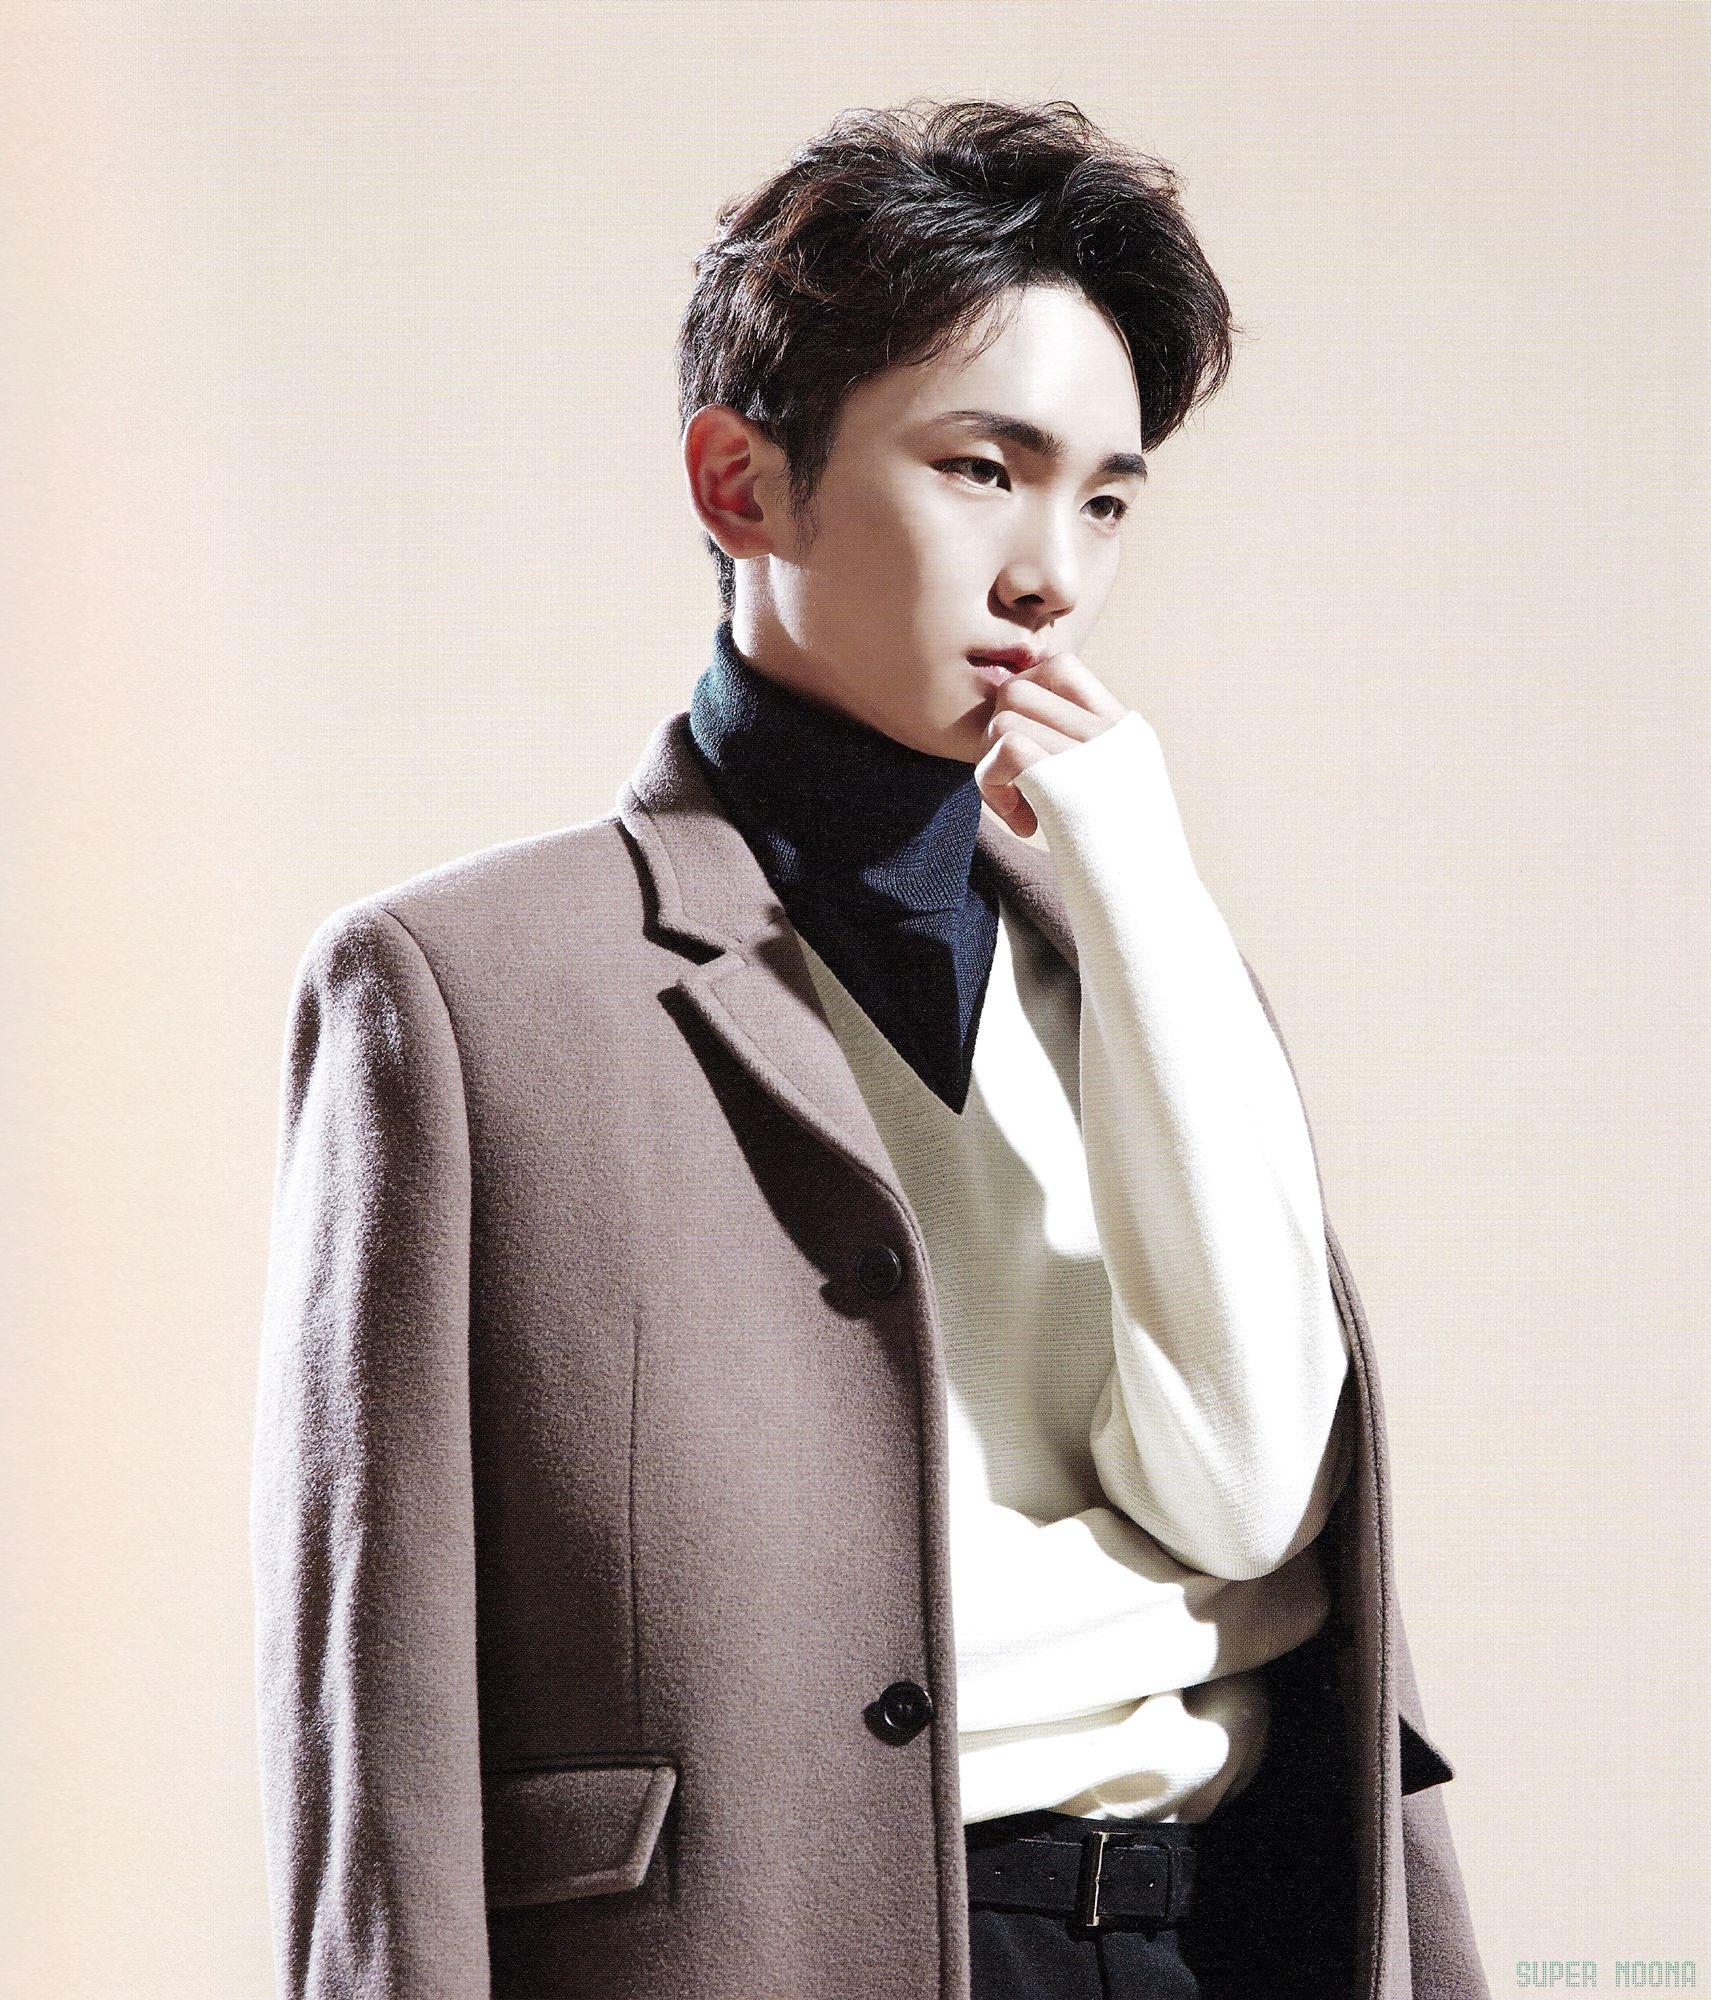 SHINee Key | SHINee | Pinterest | Shinee, Key and Kim kibum